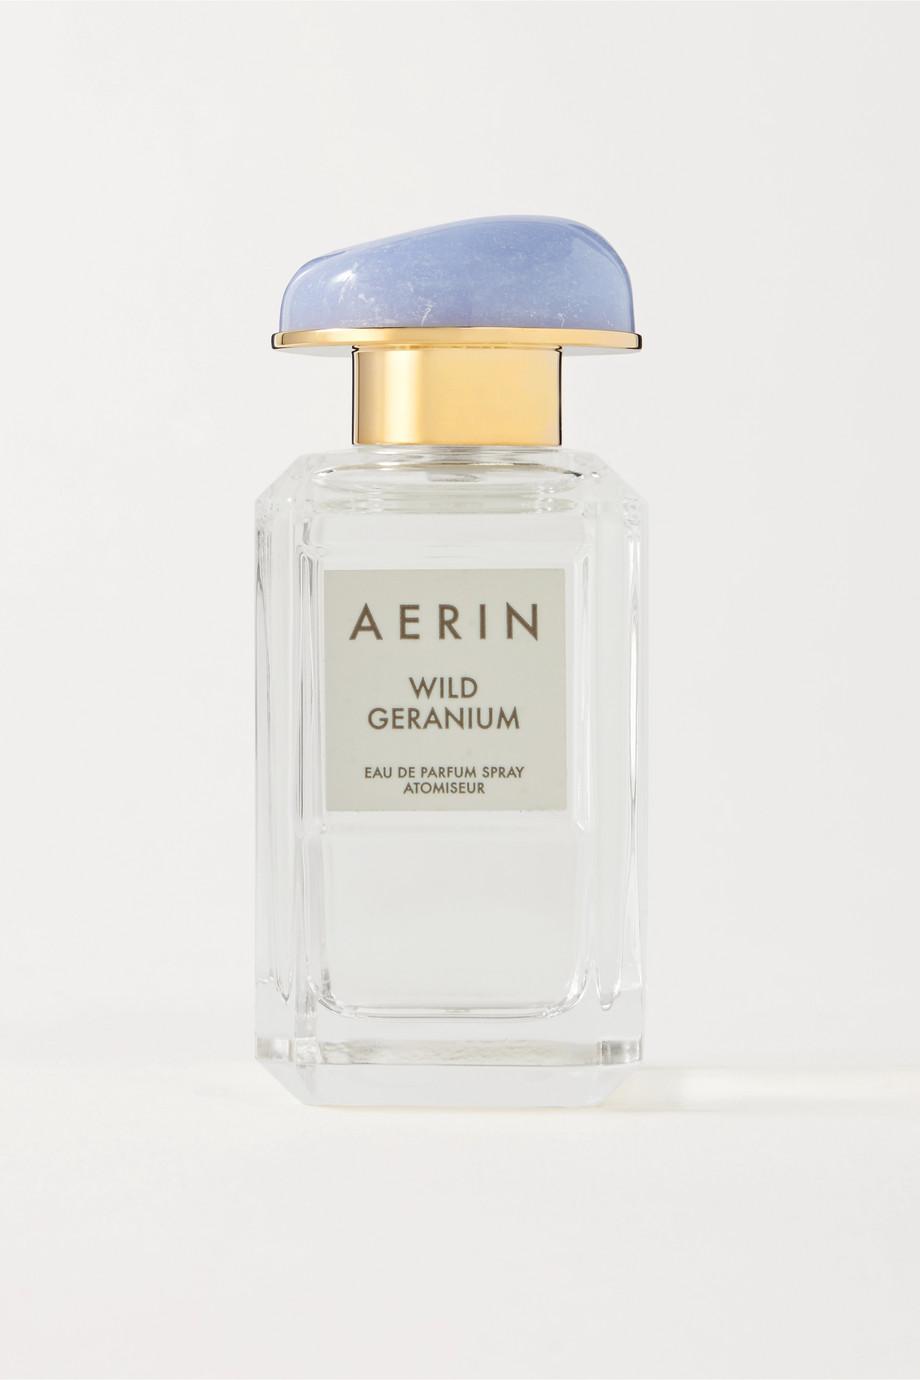 AERIN Beauty Wild Geranium, 50 ml – Eau de Parfum